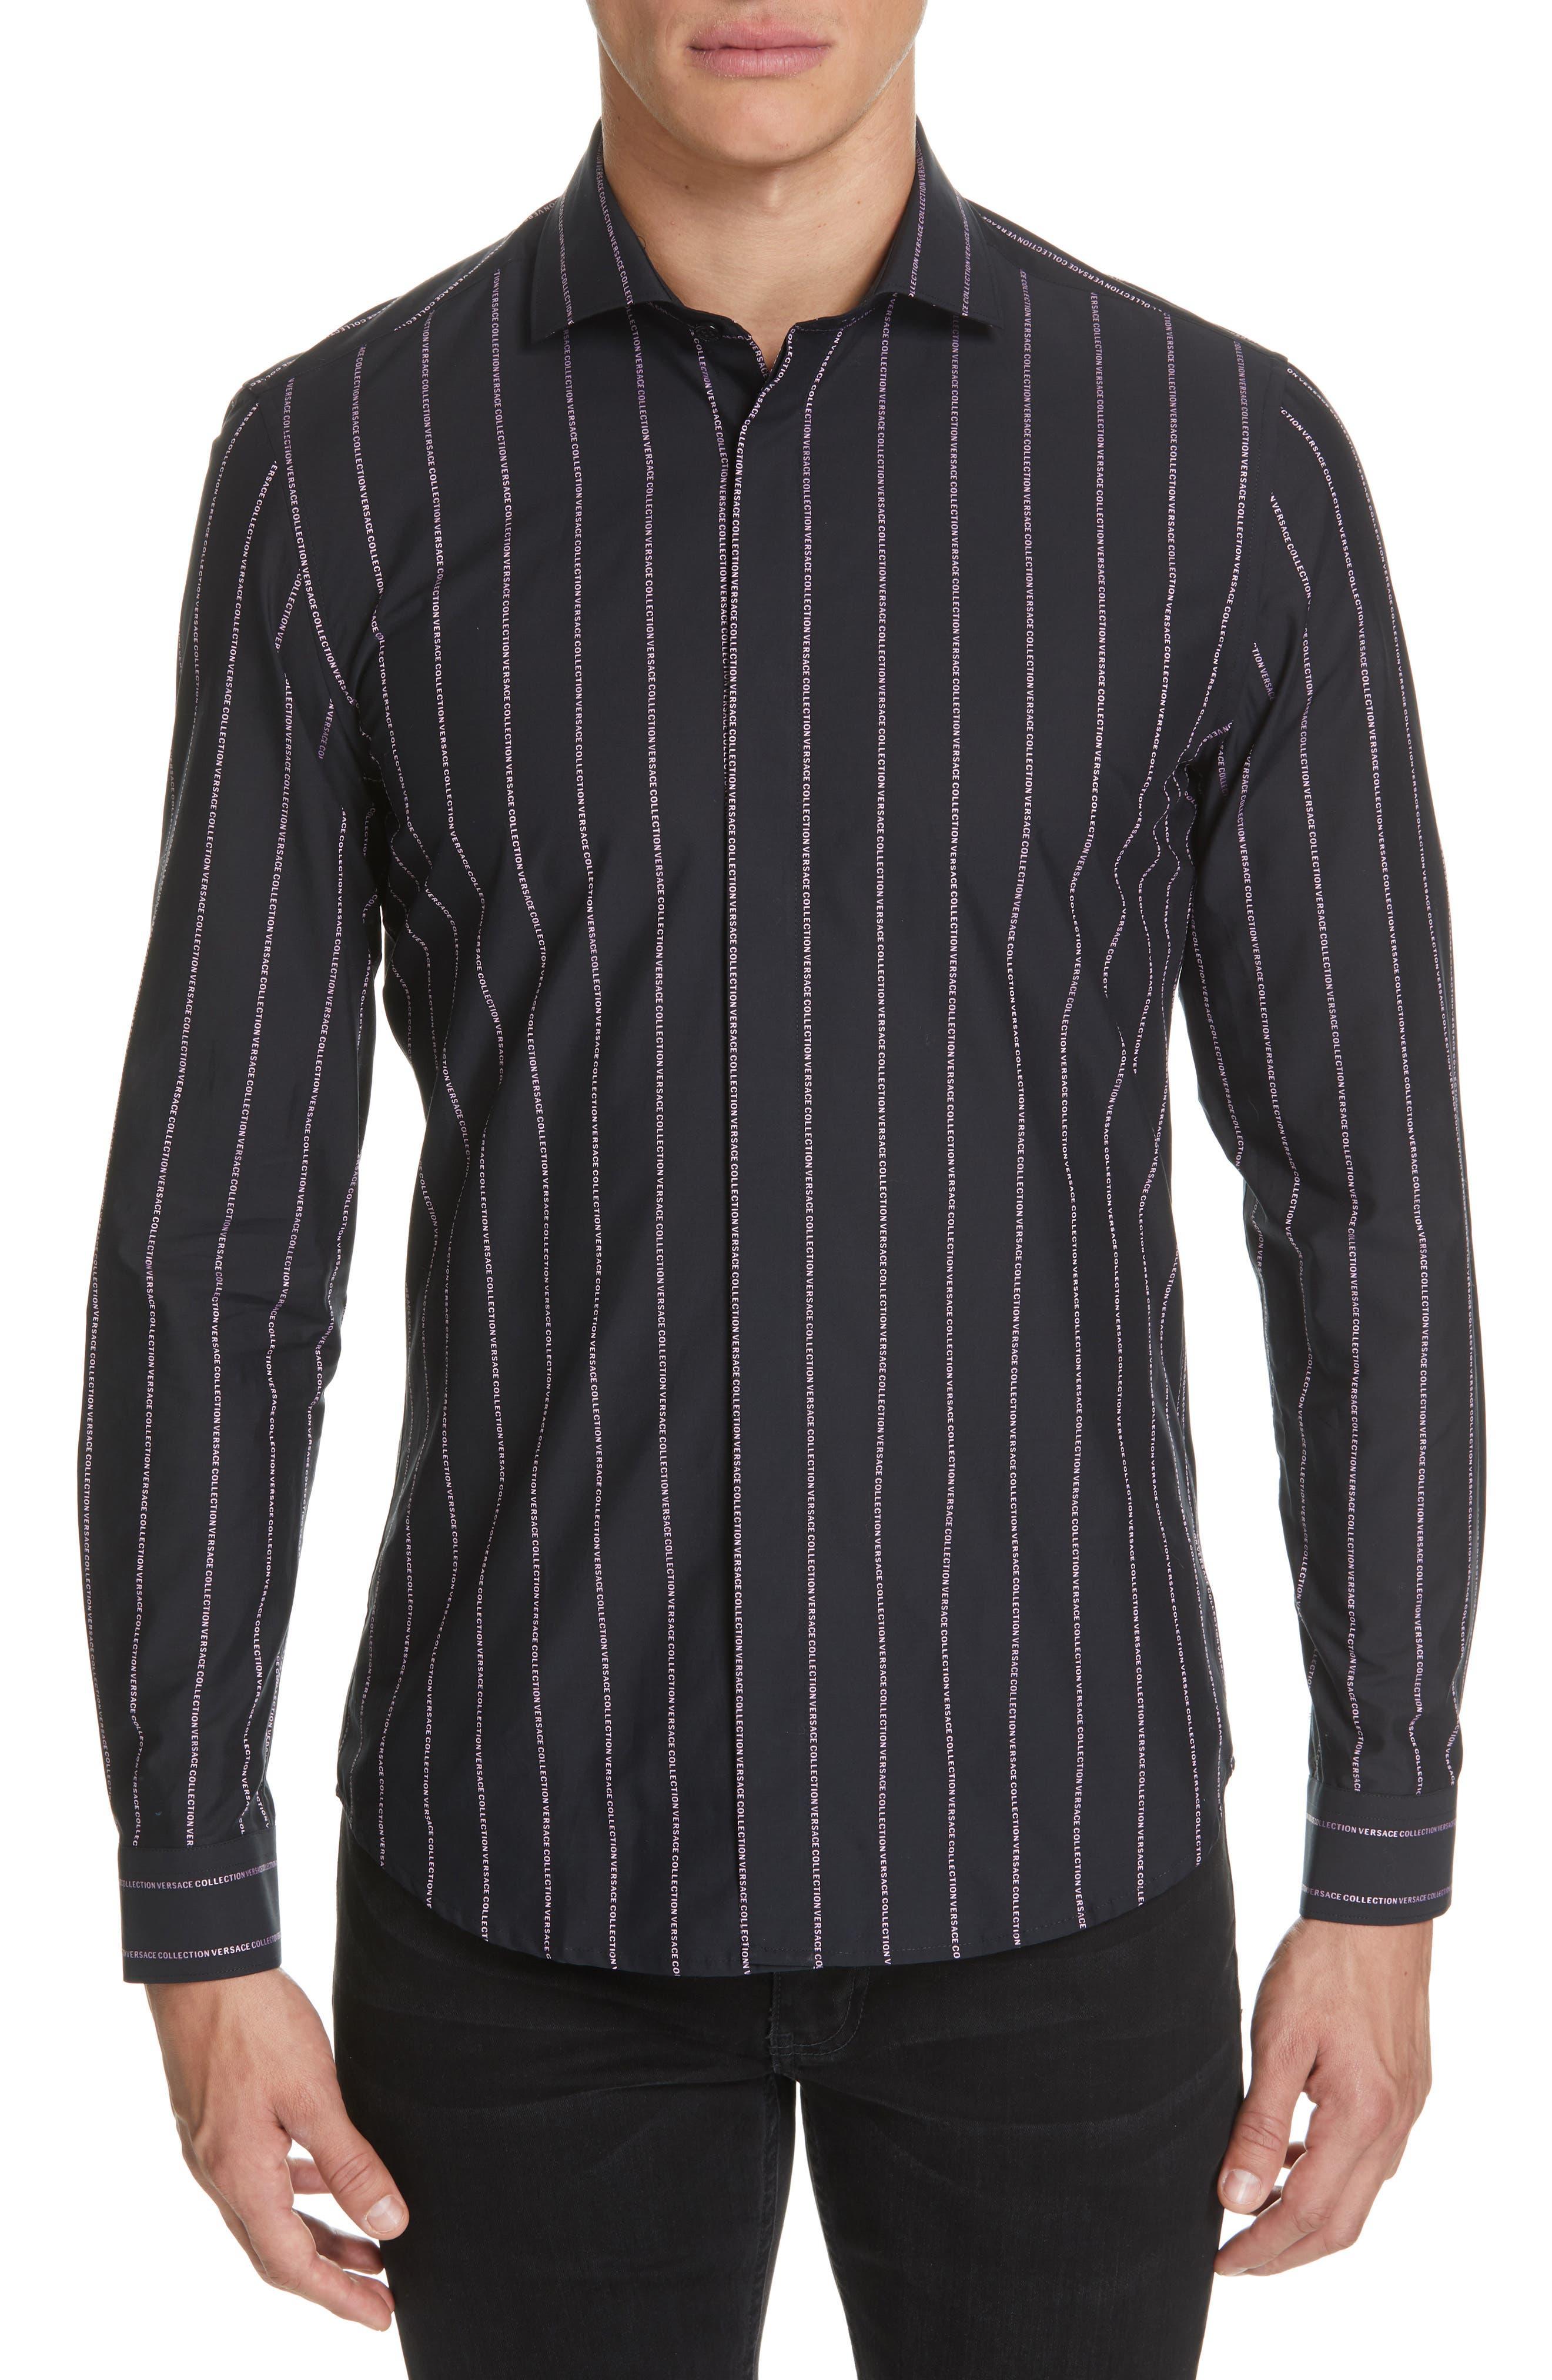 VERSACE COLLECTION, Logo Stripe Sport Shirt, Main thumbnail 1, color, BLACK/ PINK